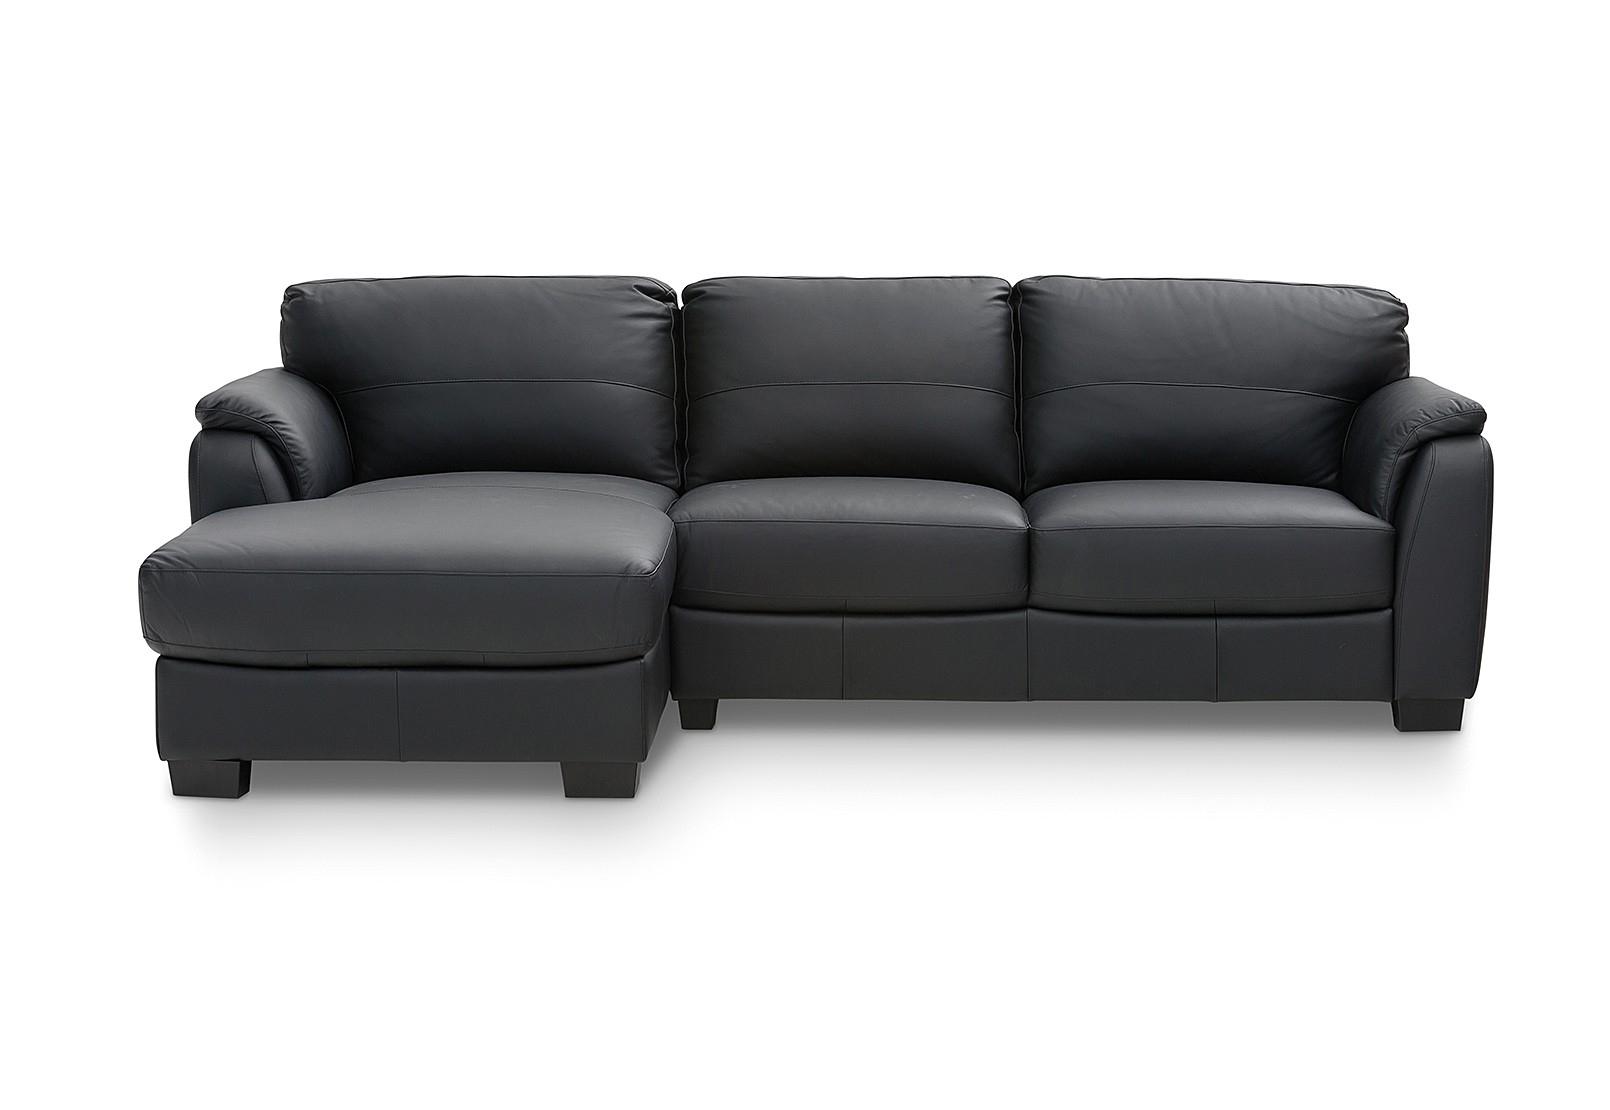 Marissa Leather 3 Seater Chaise | Amart Furniture Inside Marissa Sofa Chairs (Photo 7 of 20)